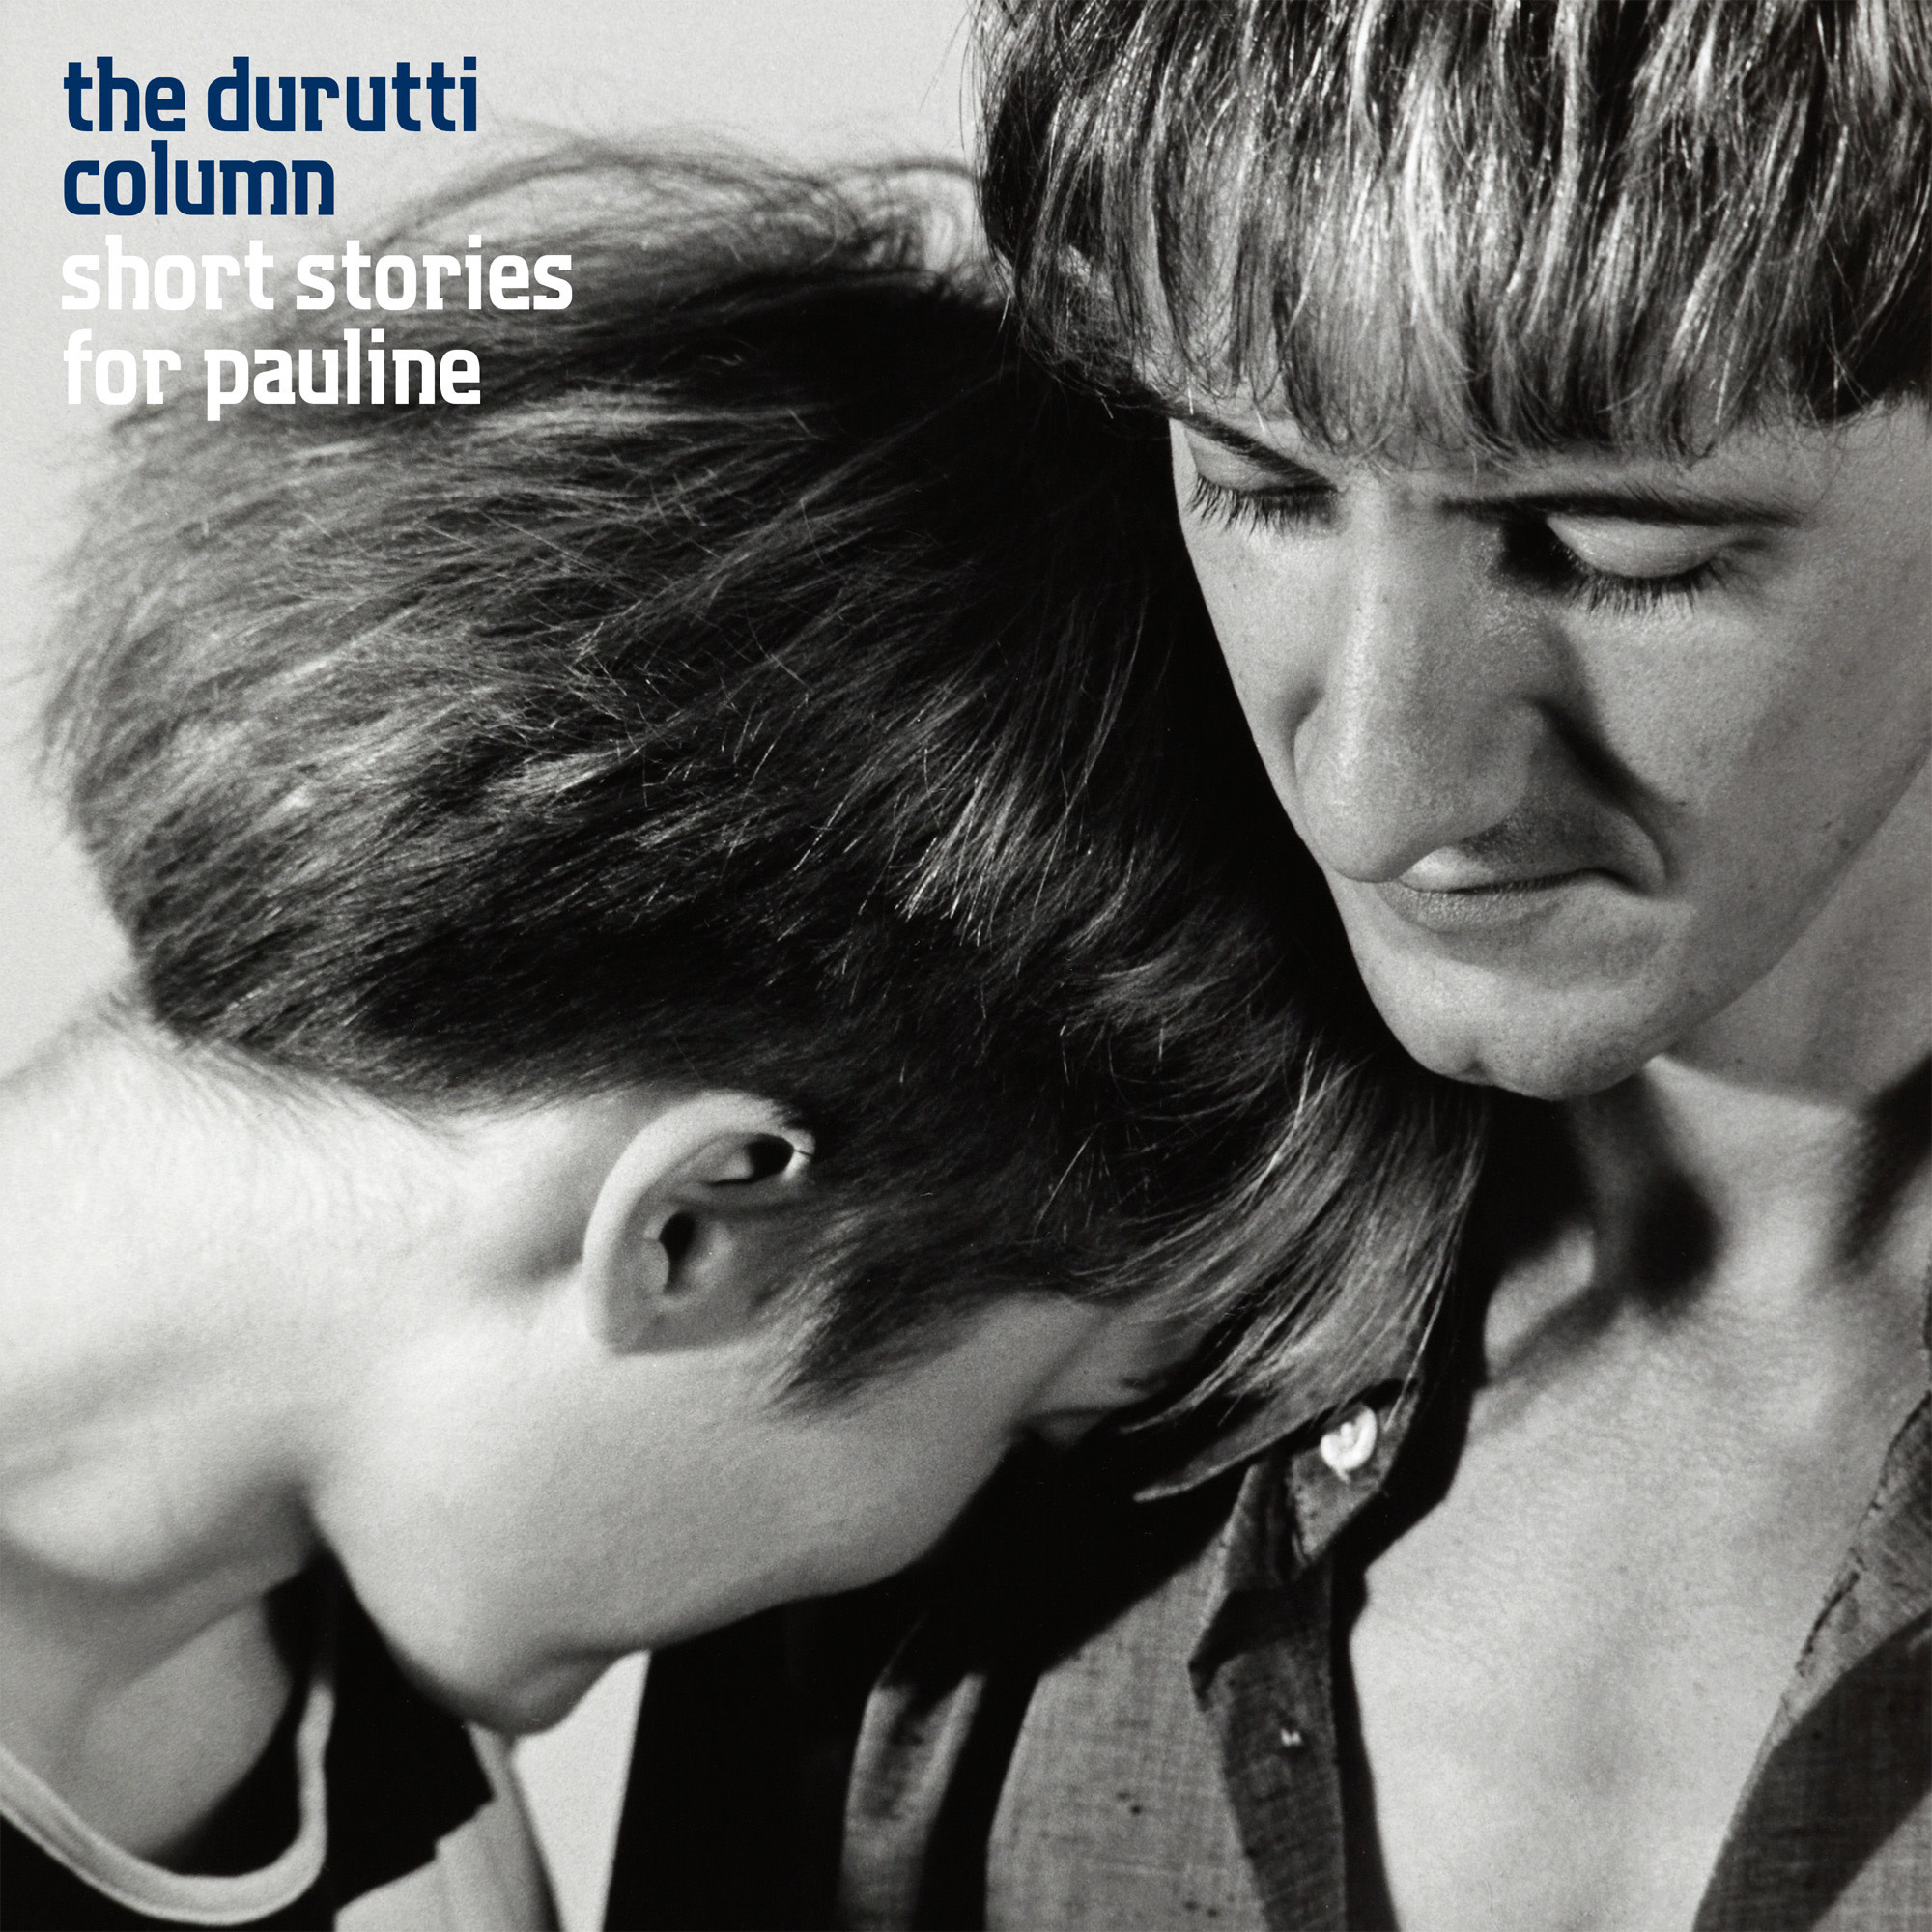 Factory Benelux Durutti Column - Short Stories For Pauline (Blue Vinyl)